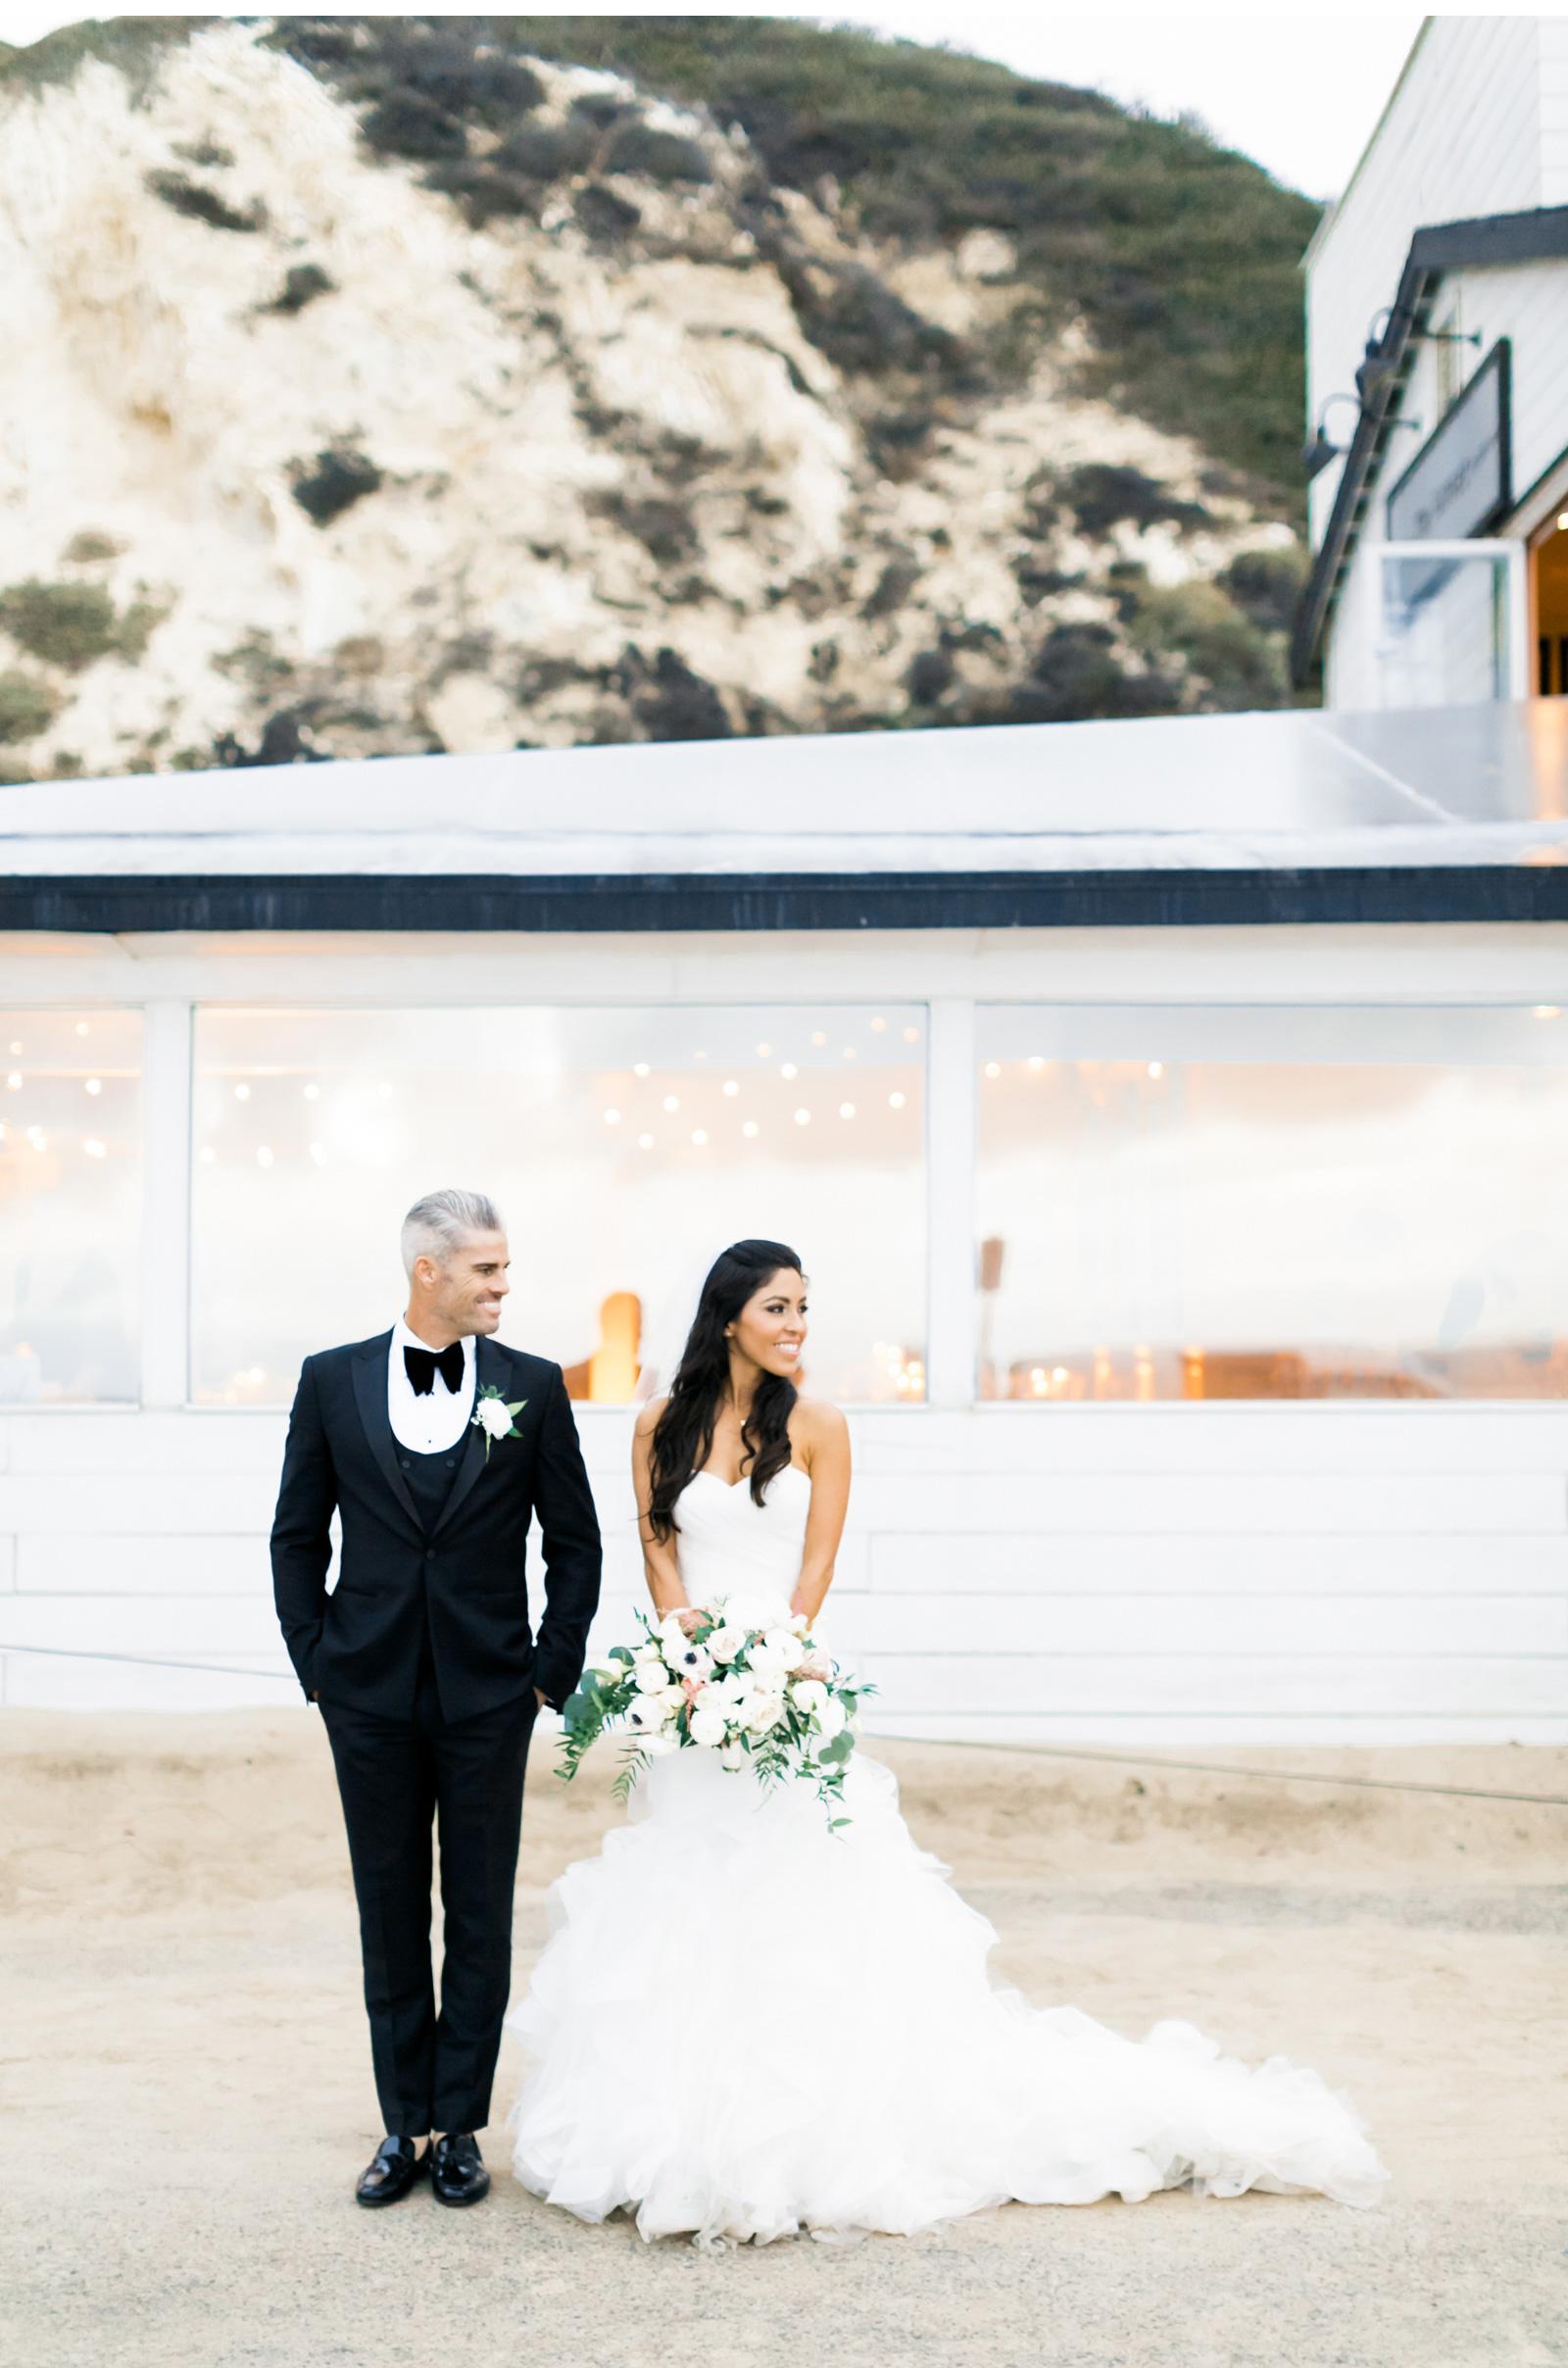 Style-Me-Pretty-Malibu-Beach-CA-Wedding-Natalie-Schutt-Photography_04.jpg